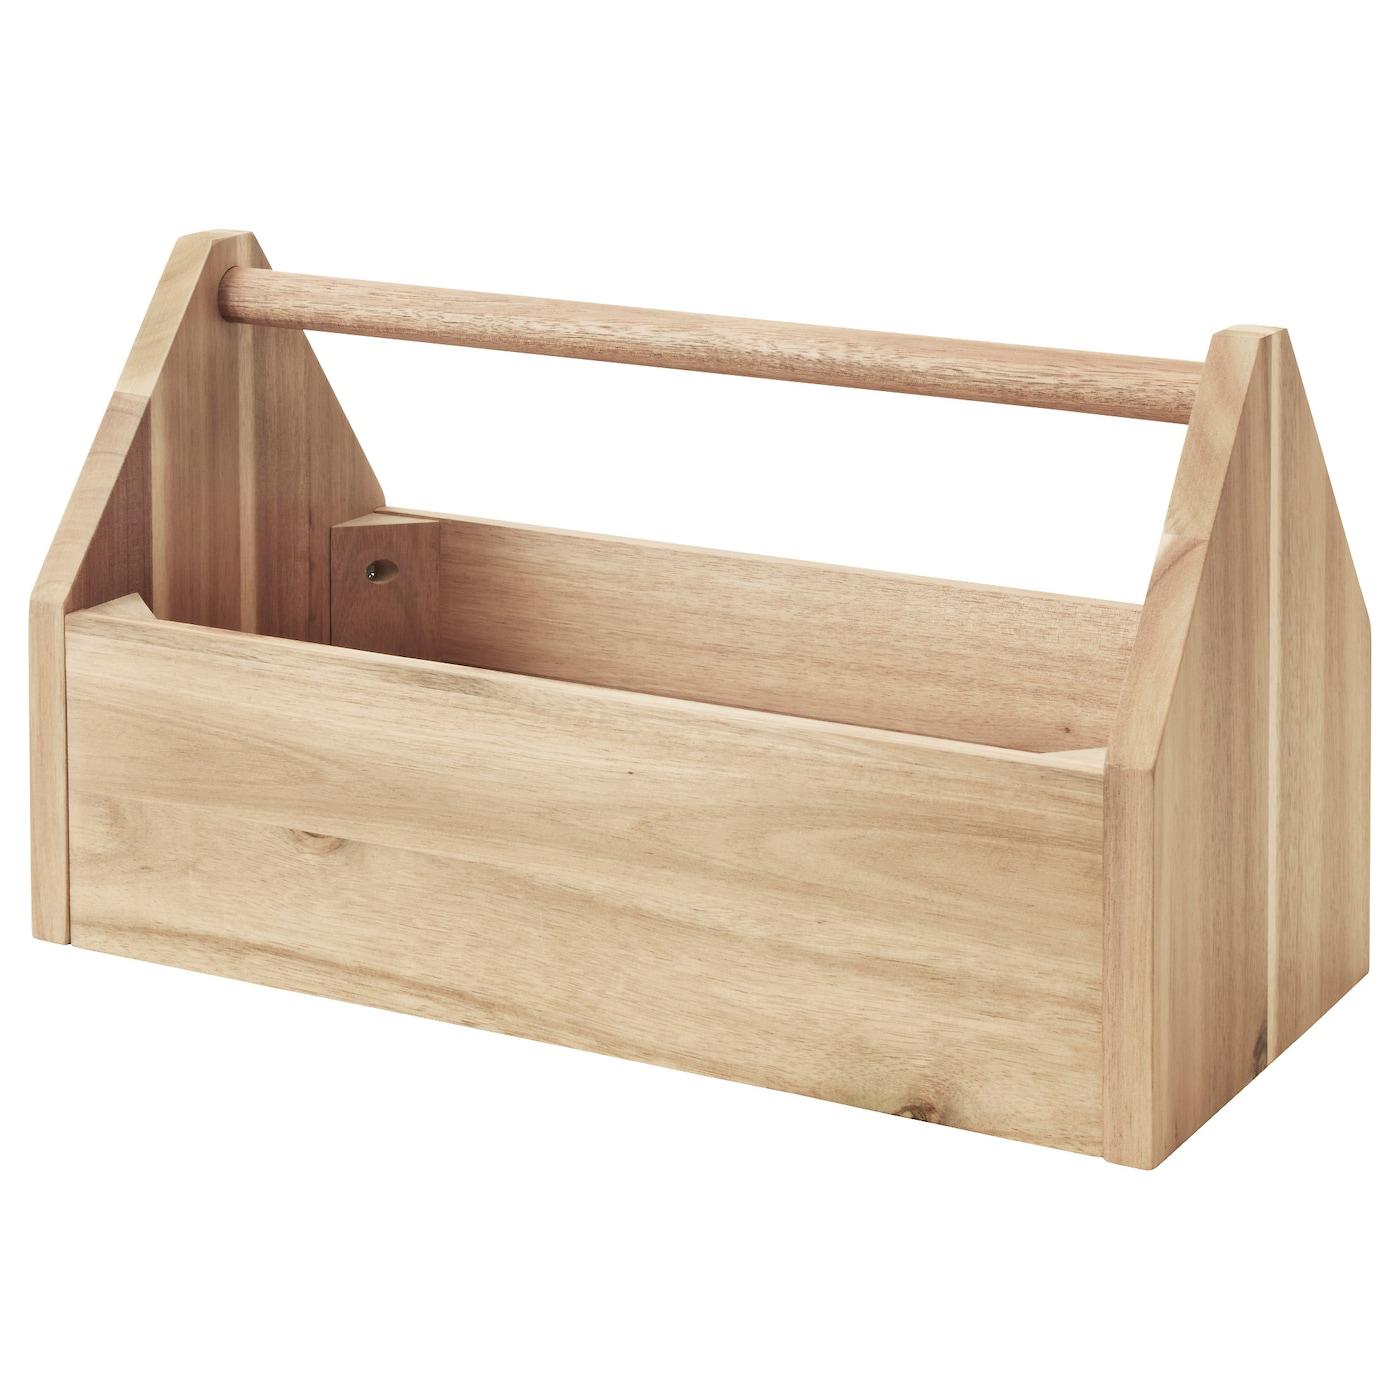 Ikea Skogsta Box With Handle